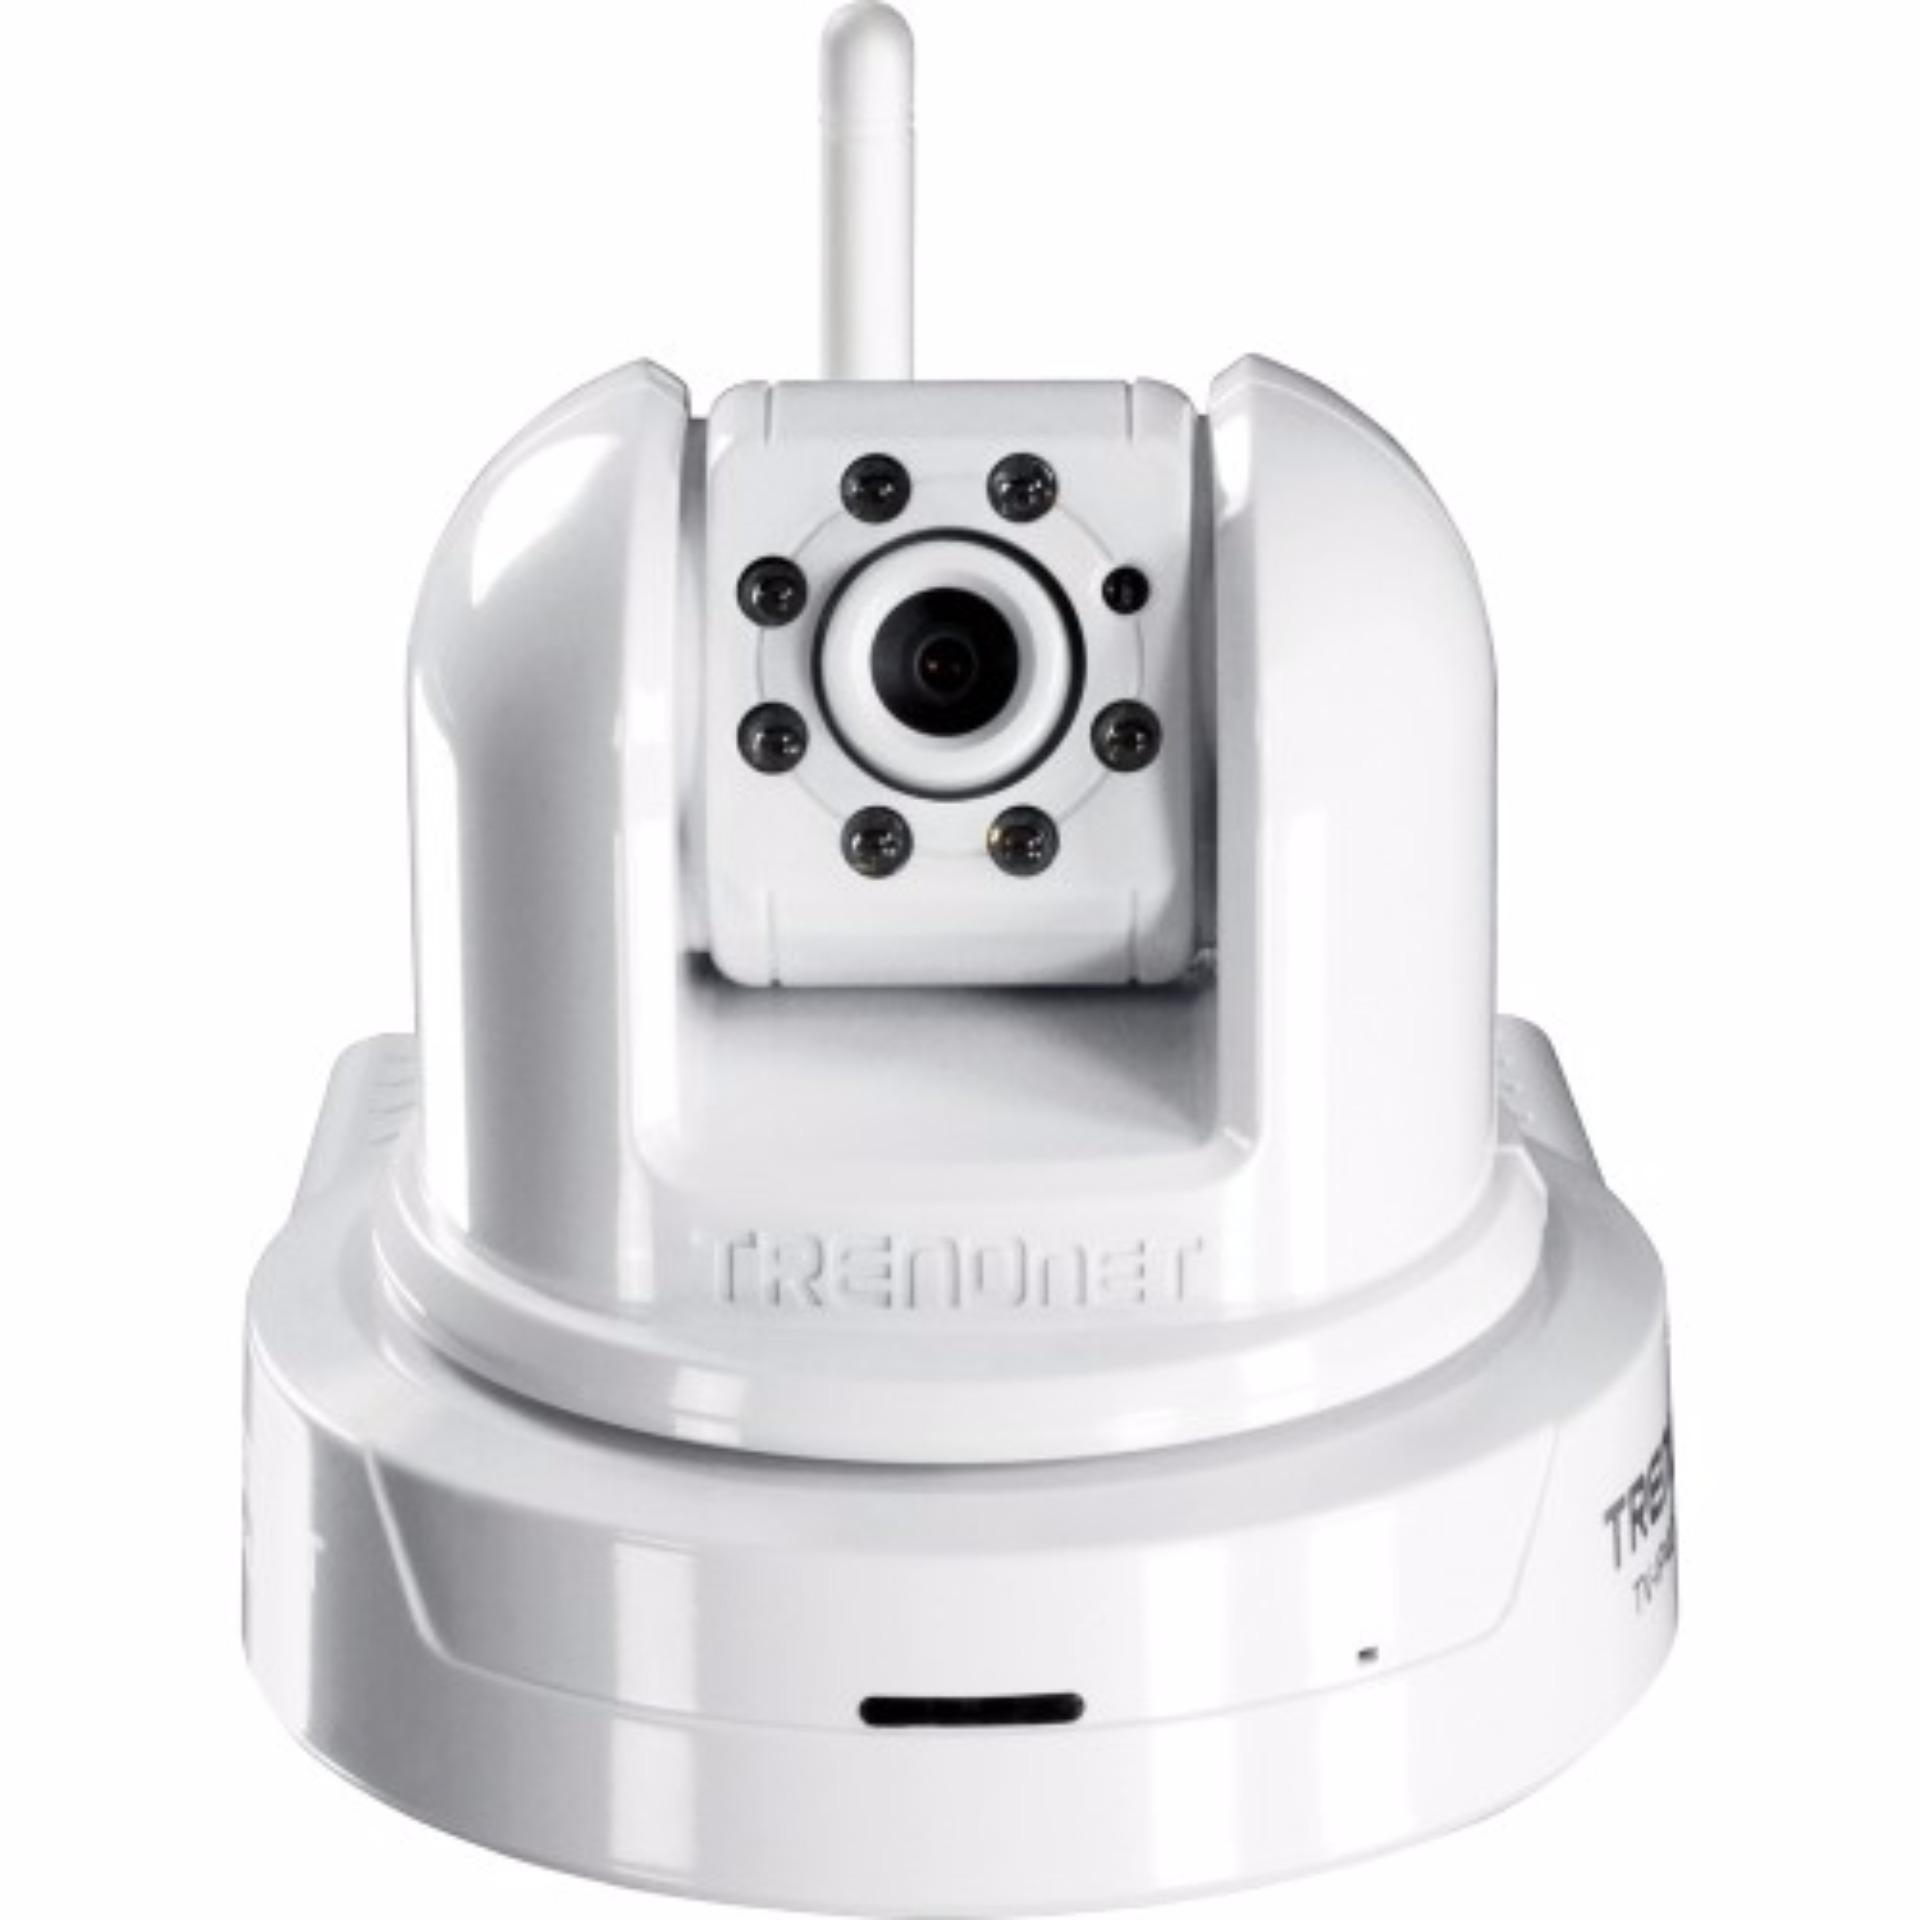 Trendnet Tv-Ip422Wn Securview Wireless N Day/Night Pan/Tilt/Zoom Network Camera